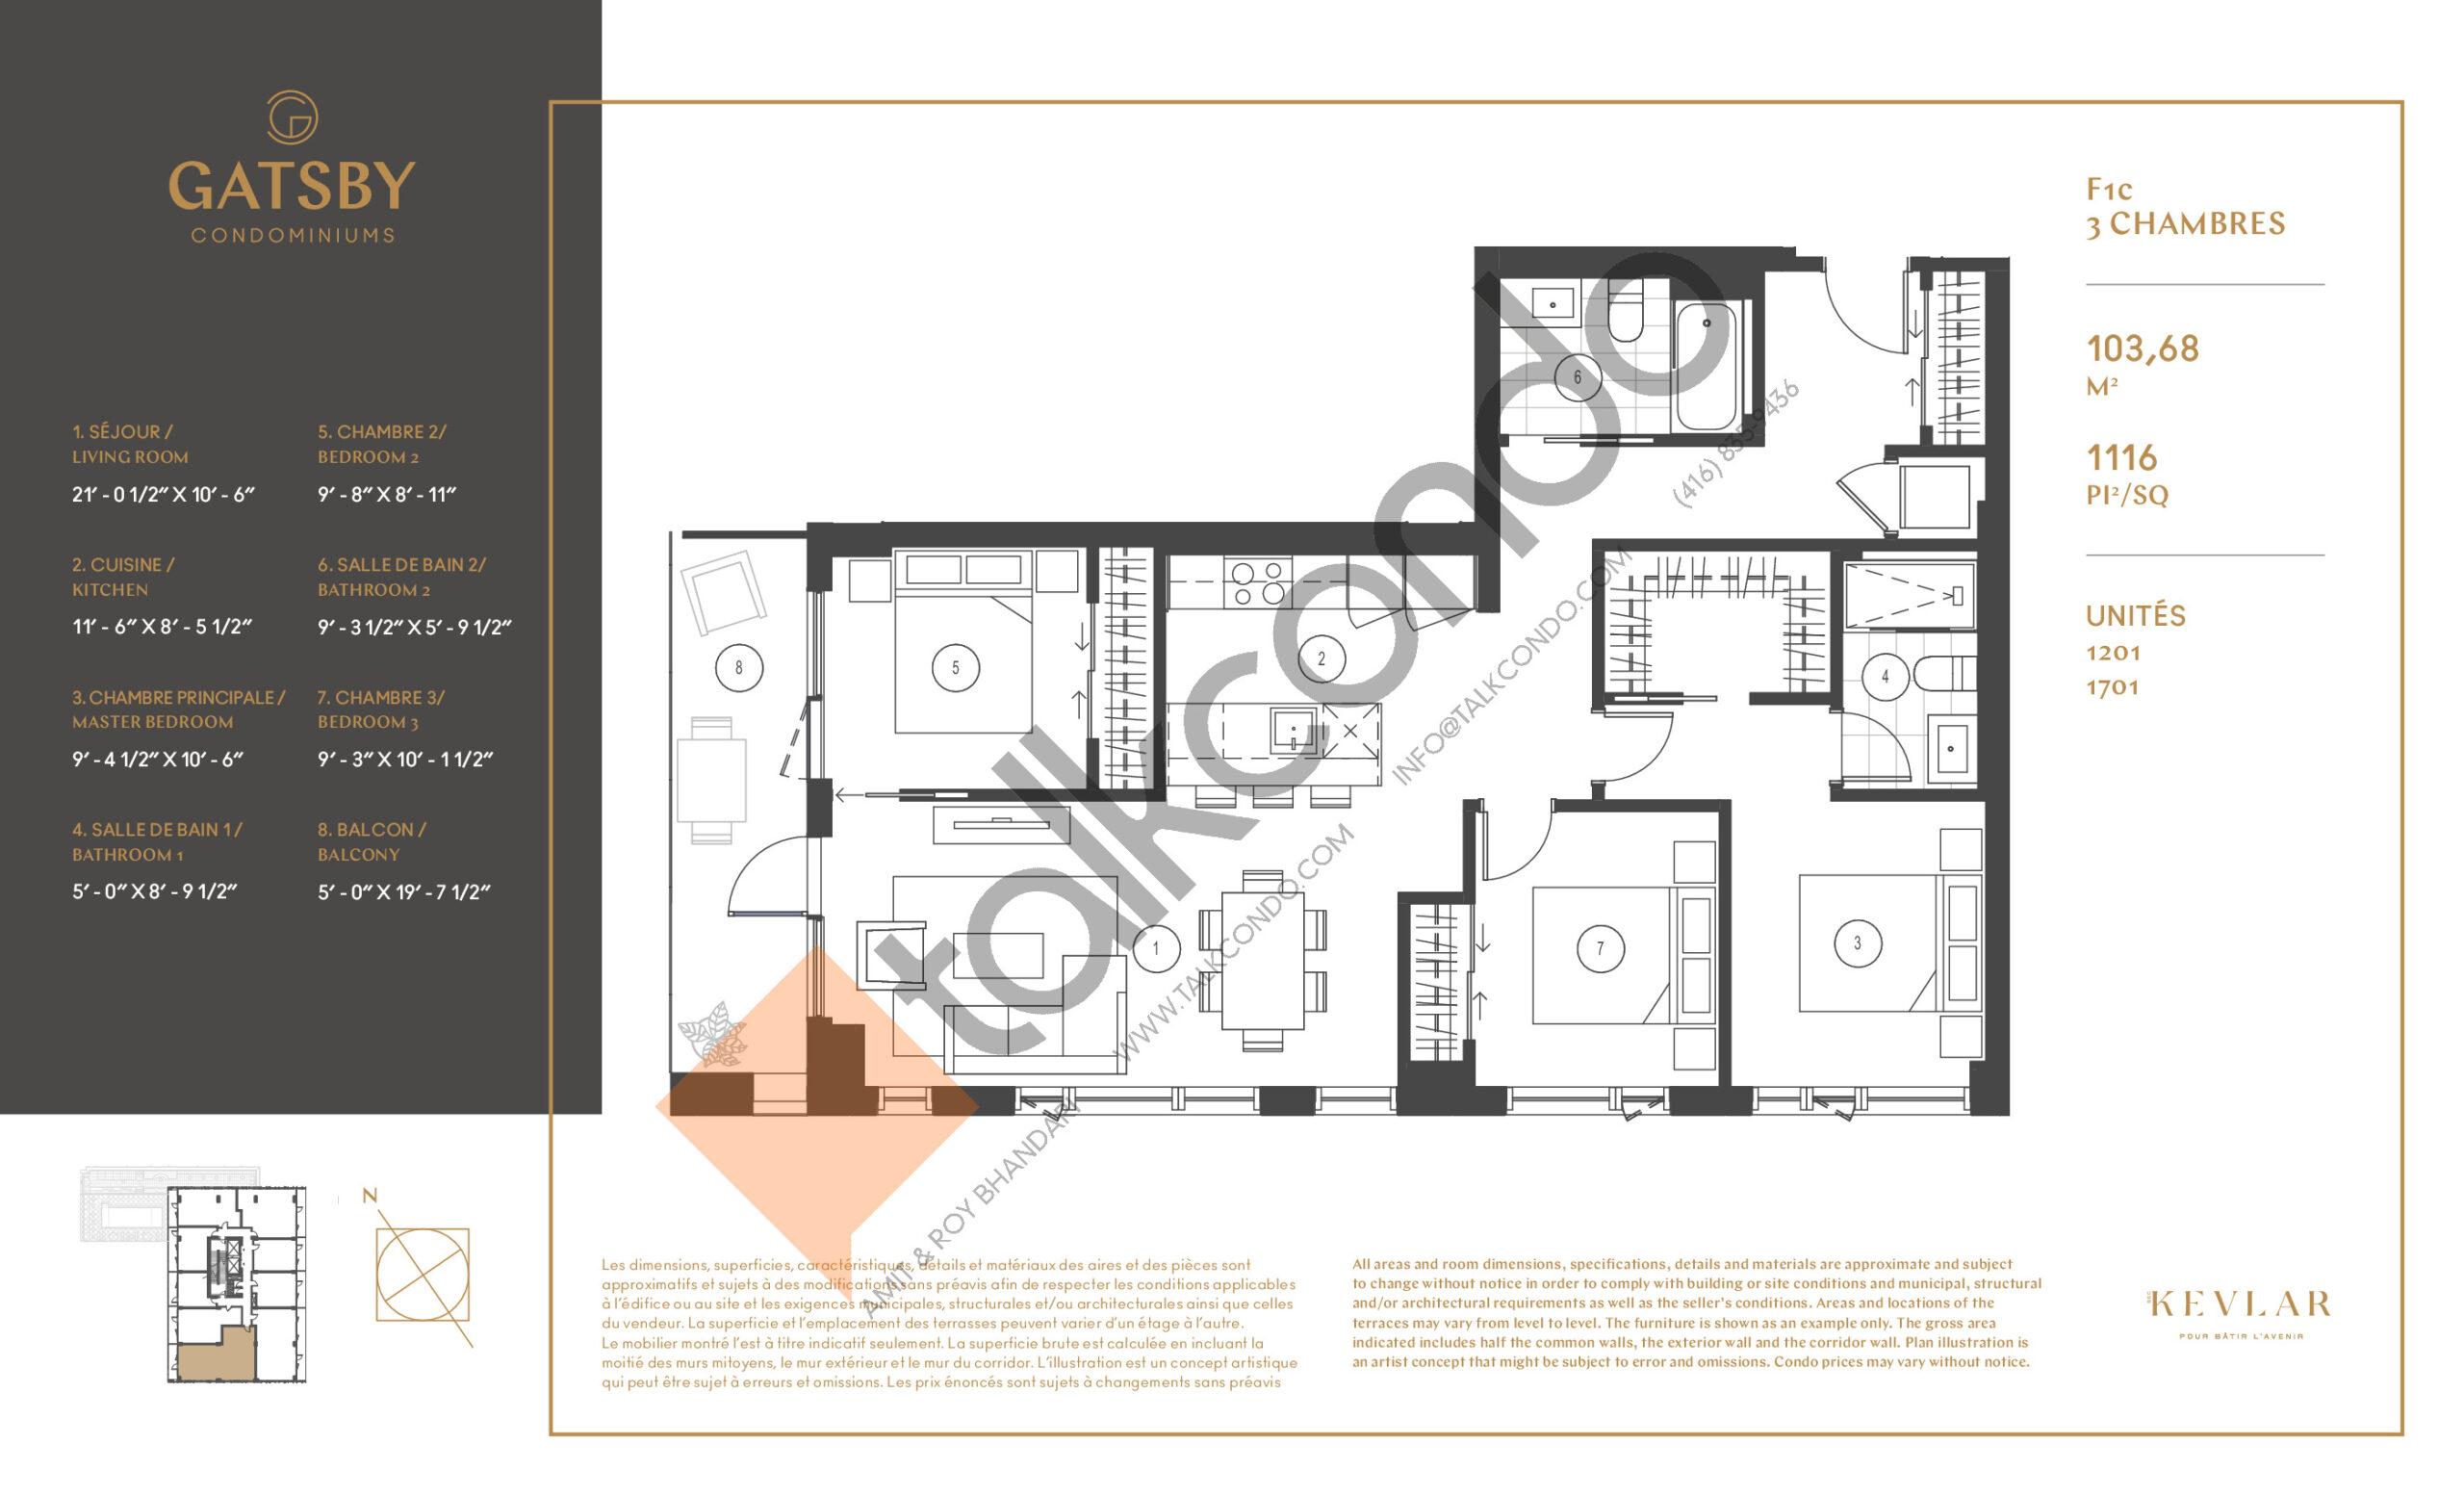 F1c Floor Plan at Gatsby Condos - 1116 sq.ft